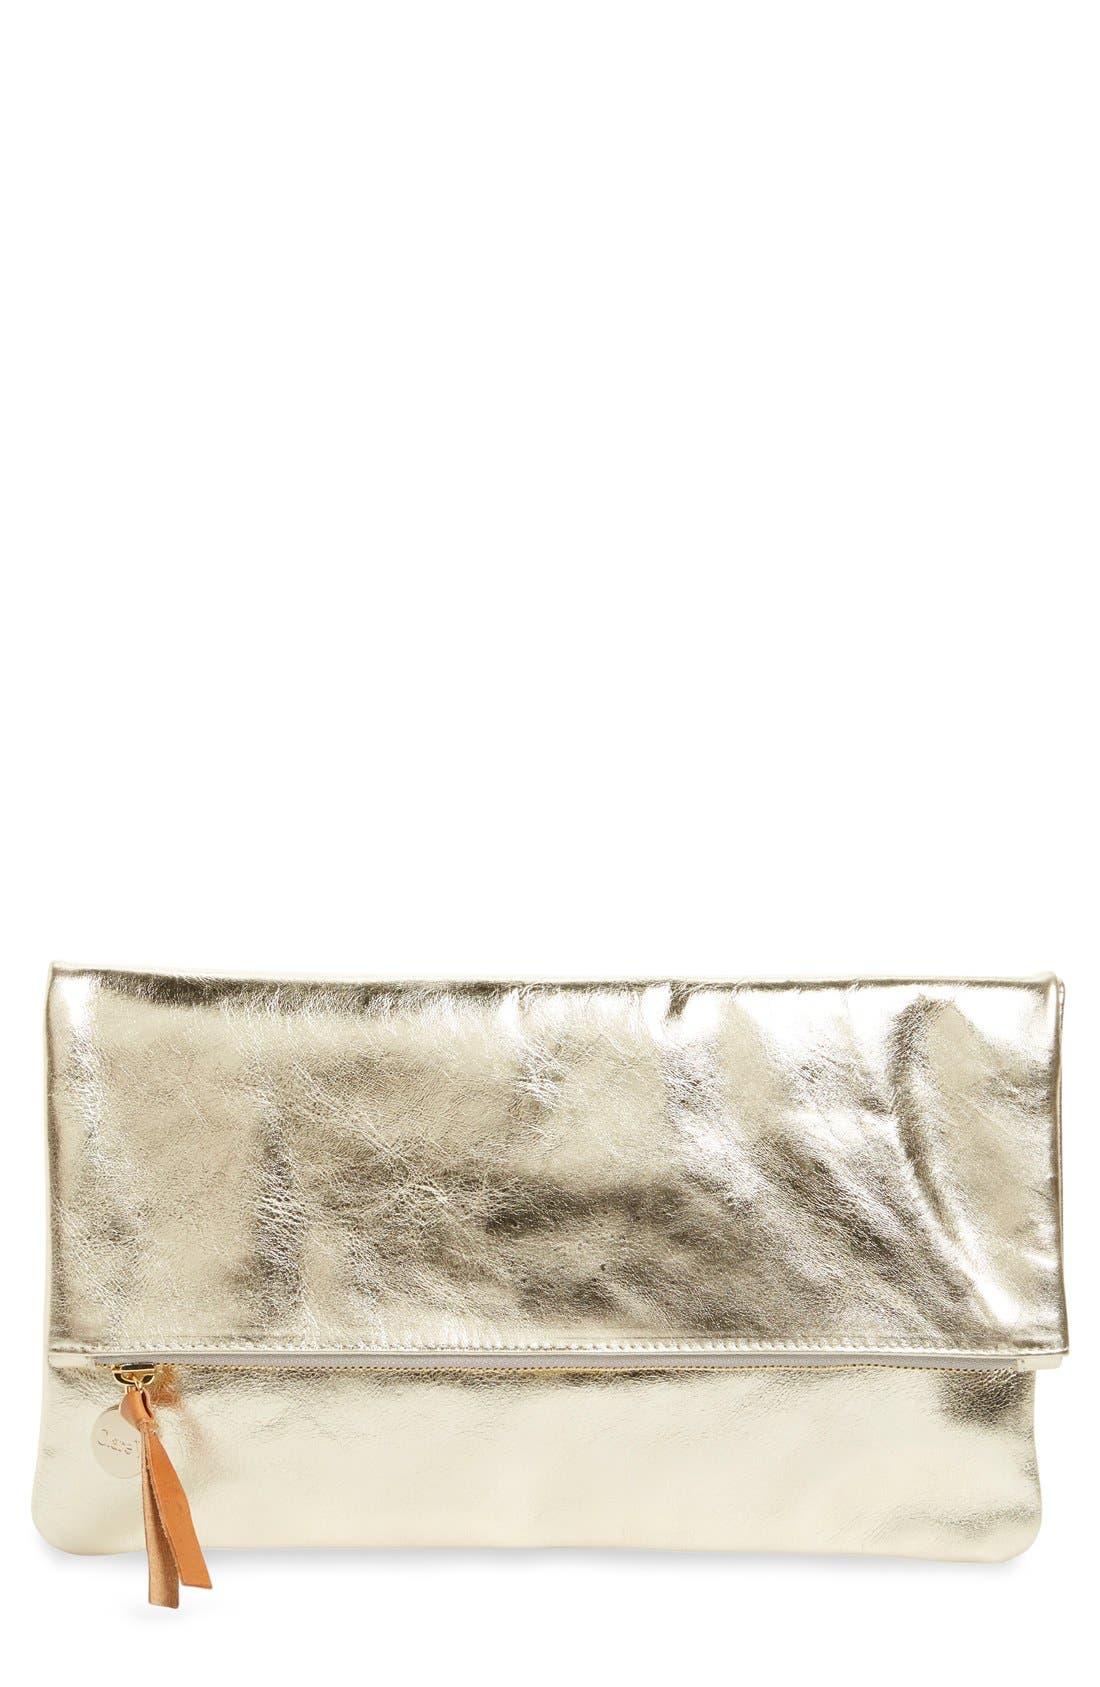 'Maison' Metallic Leather Foldover Clutch, Main, color, 710